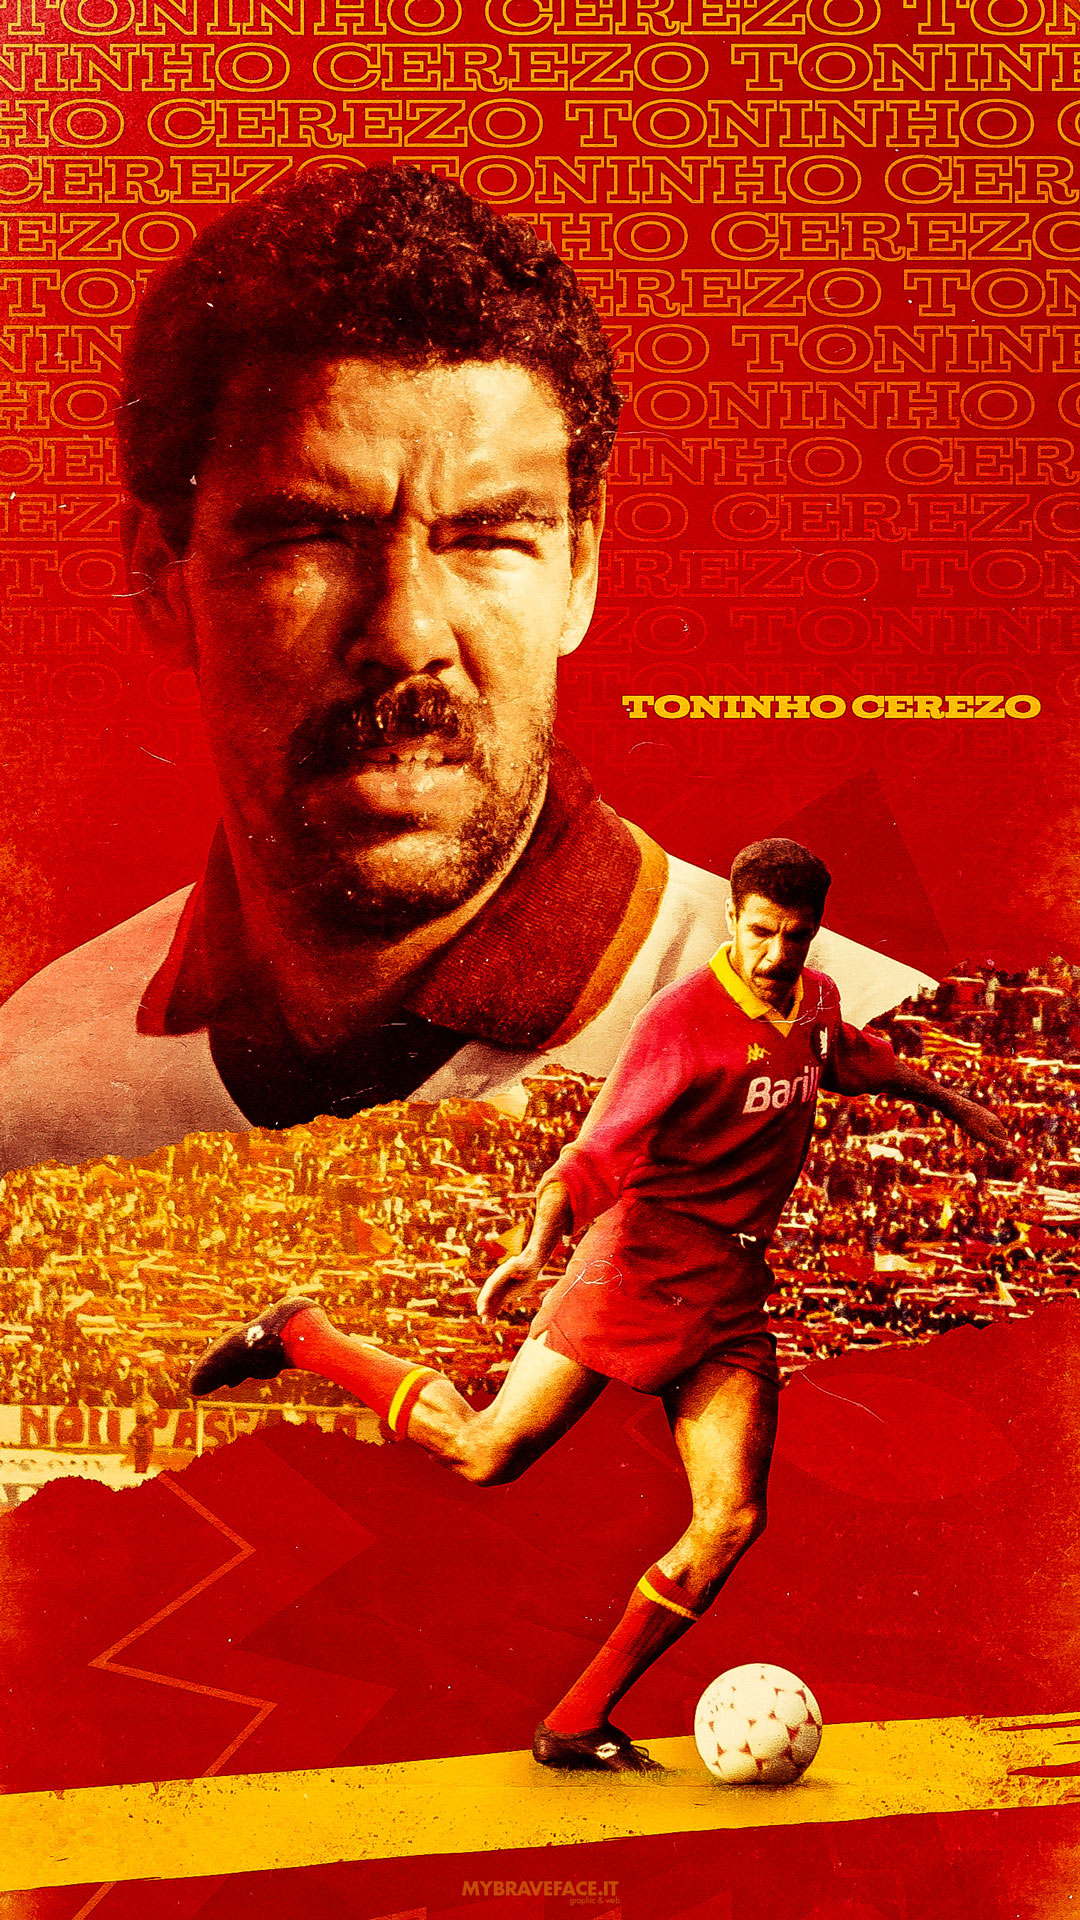 Toninho Cerezo Wallpaper lockscreen